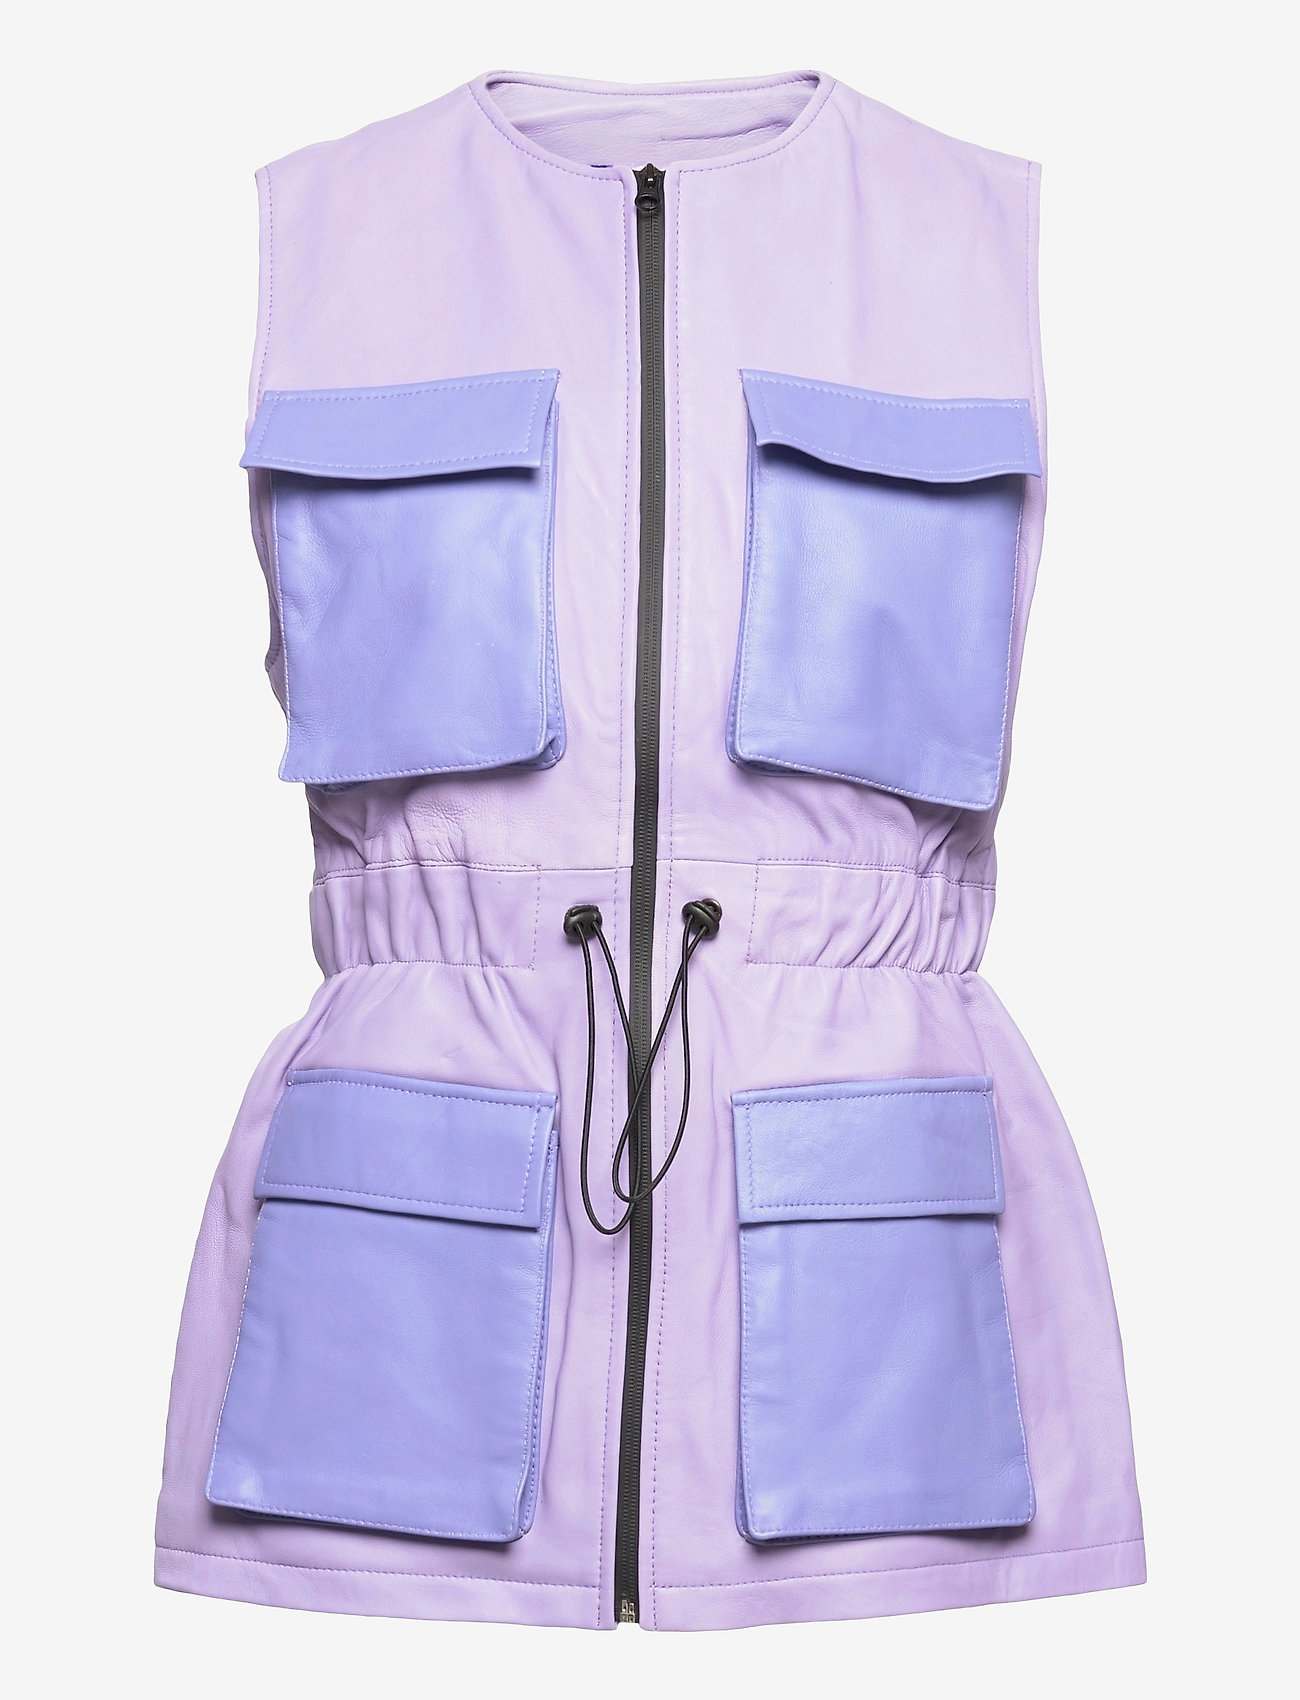 Hosbjerg - AMY BRODIE VEST - puffer vests - light purple/purple - 0